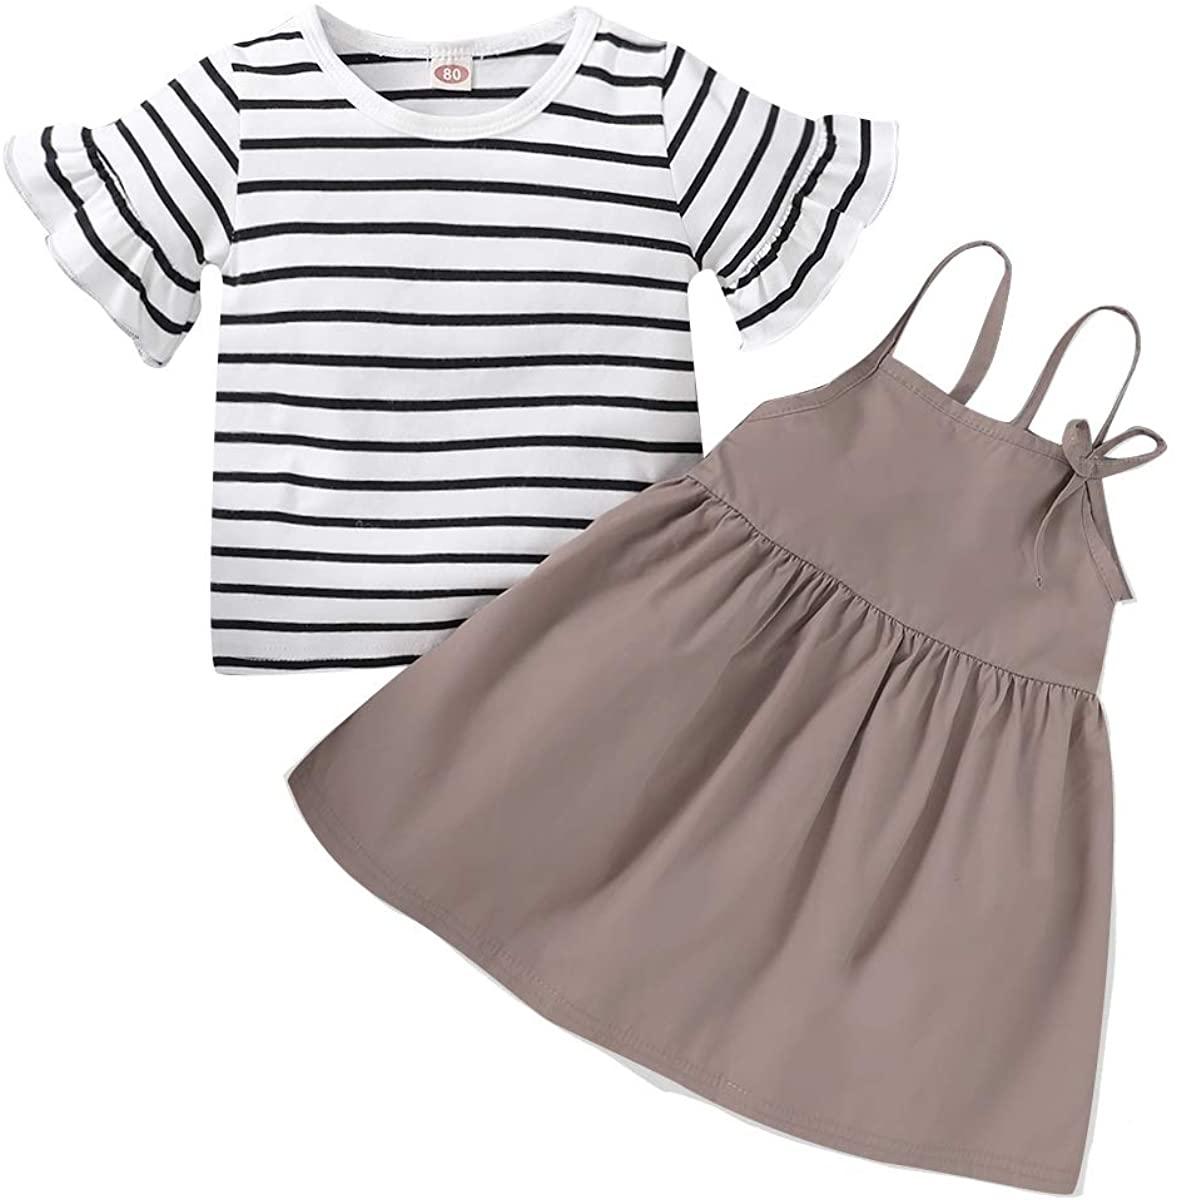 Toddler Baby Girl Summer Skirt Set Stripe Short Sleeve T-Shirt Top and Solid Color Strap Dress Infant Girl Clothes